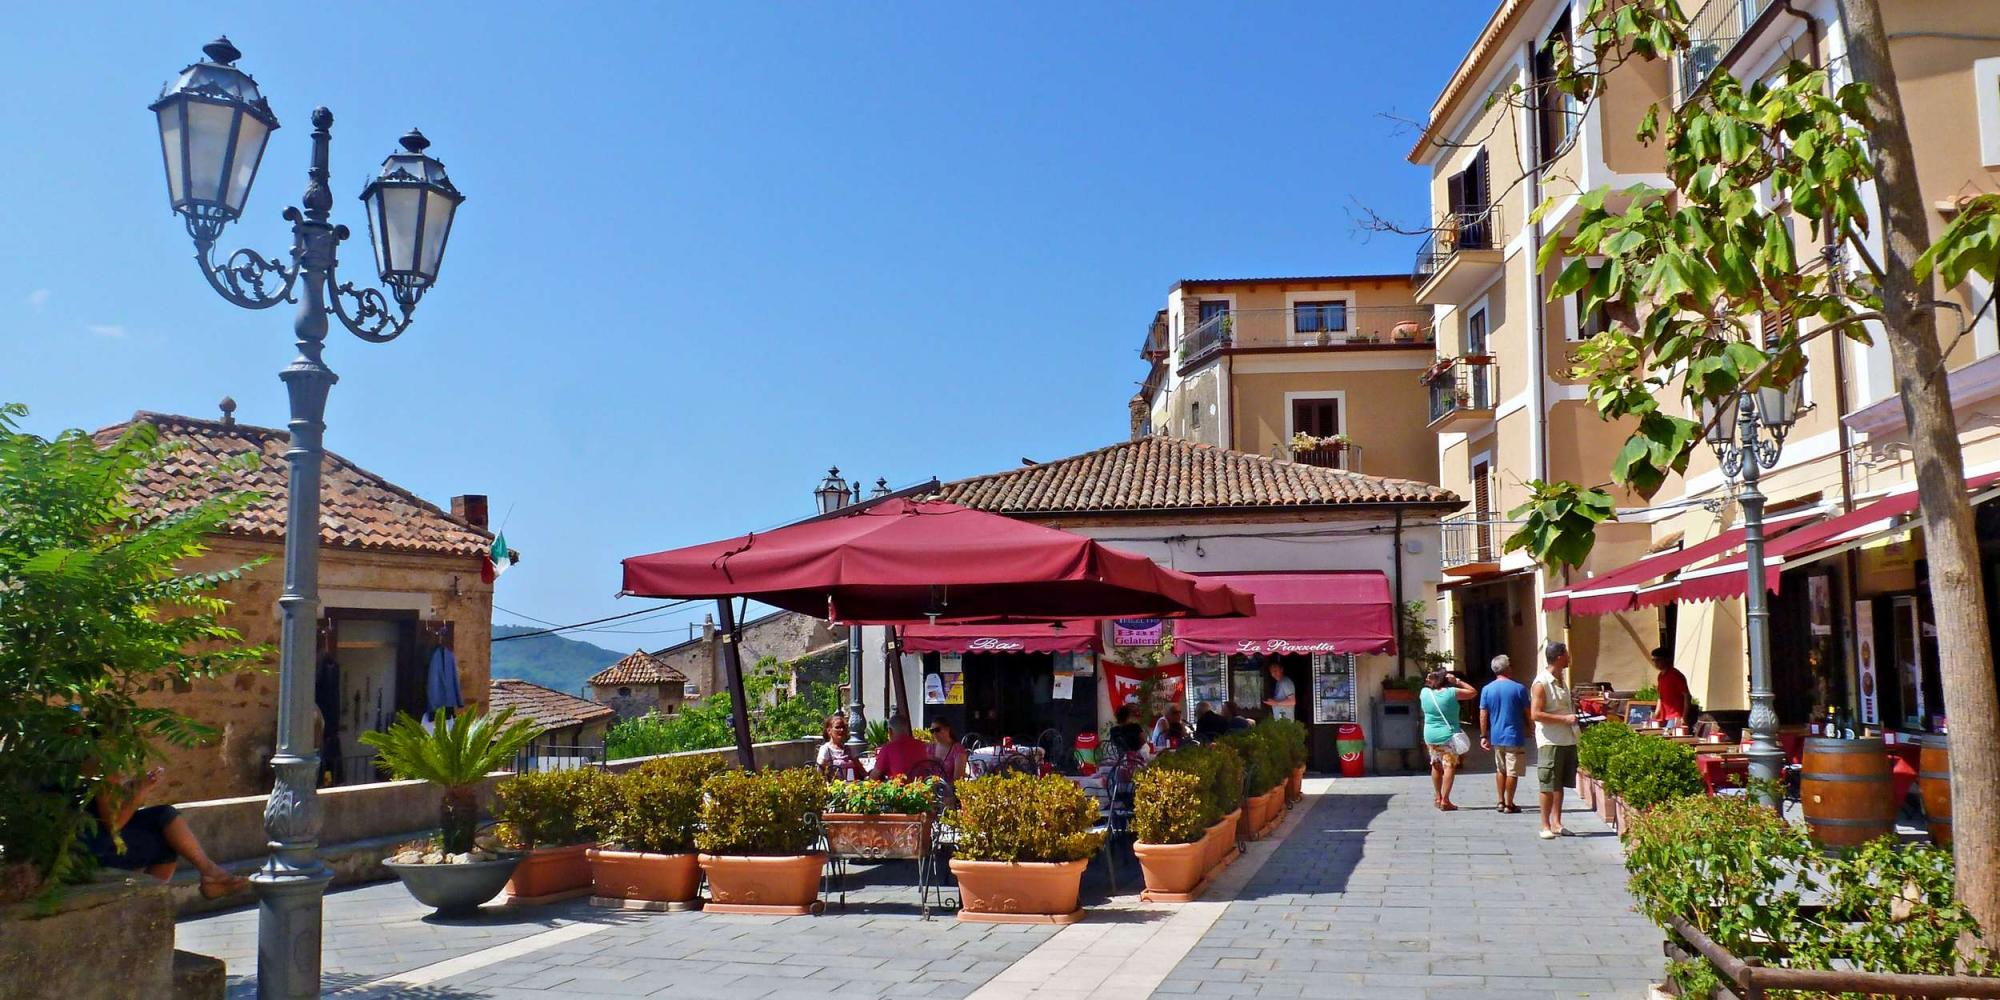 Castellabate - luoghi del film Benvenuti al Sud